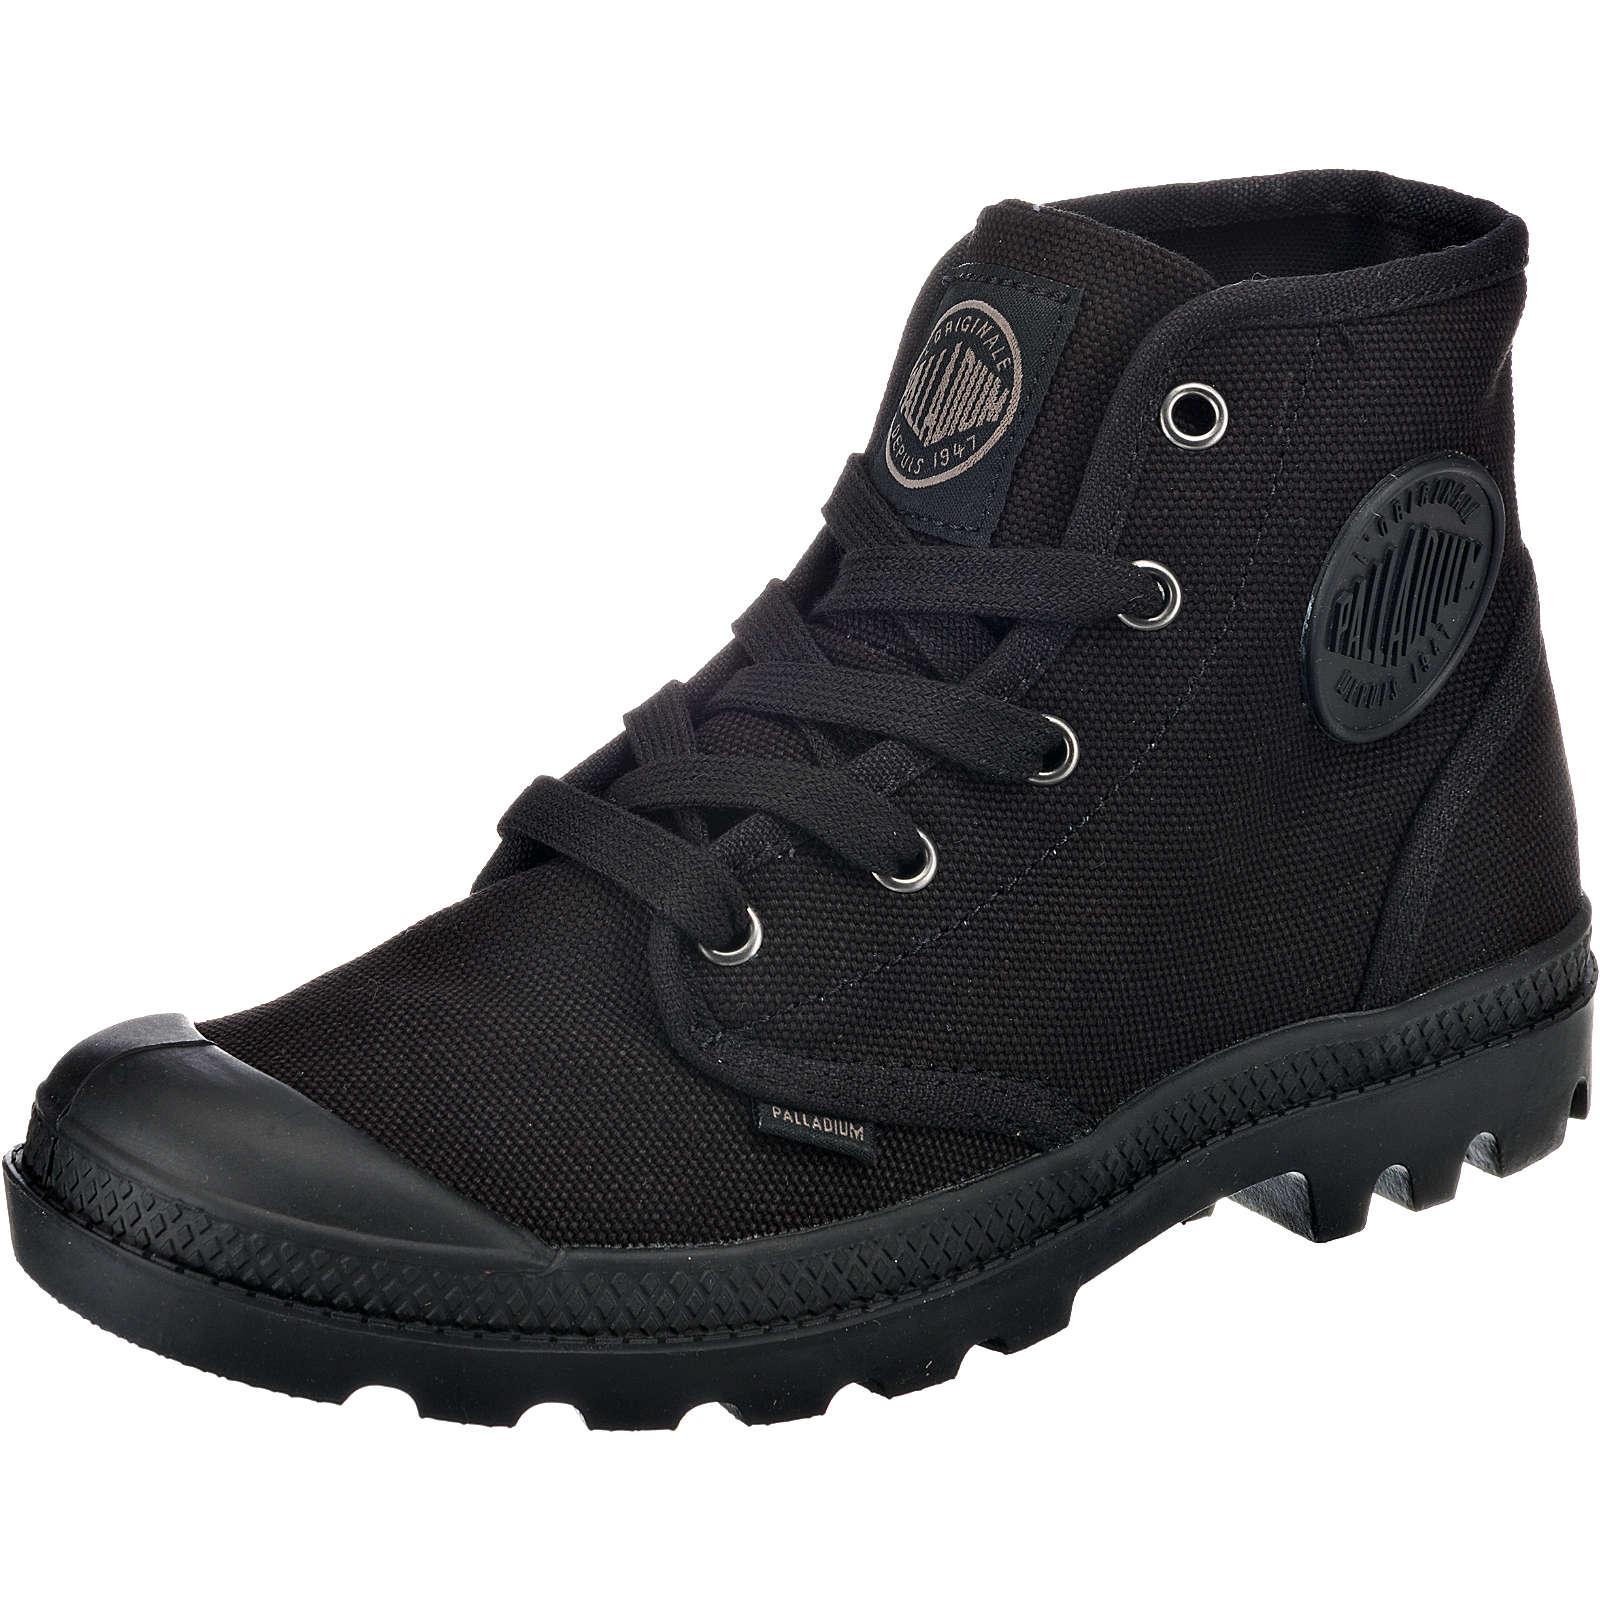 Palladium Pampa Hi Sneakers schwarz Damen Gr. 37